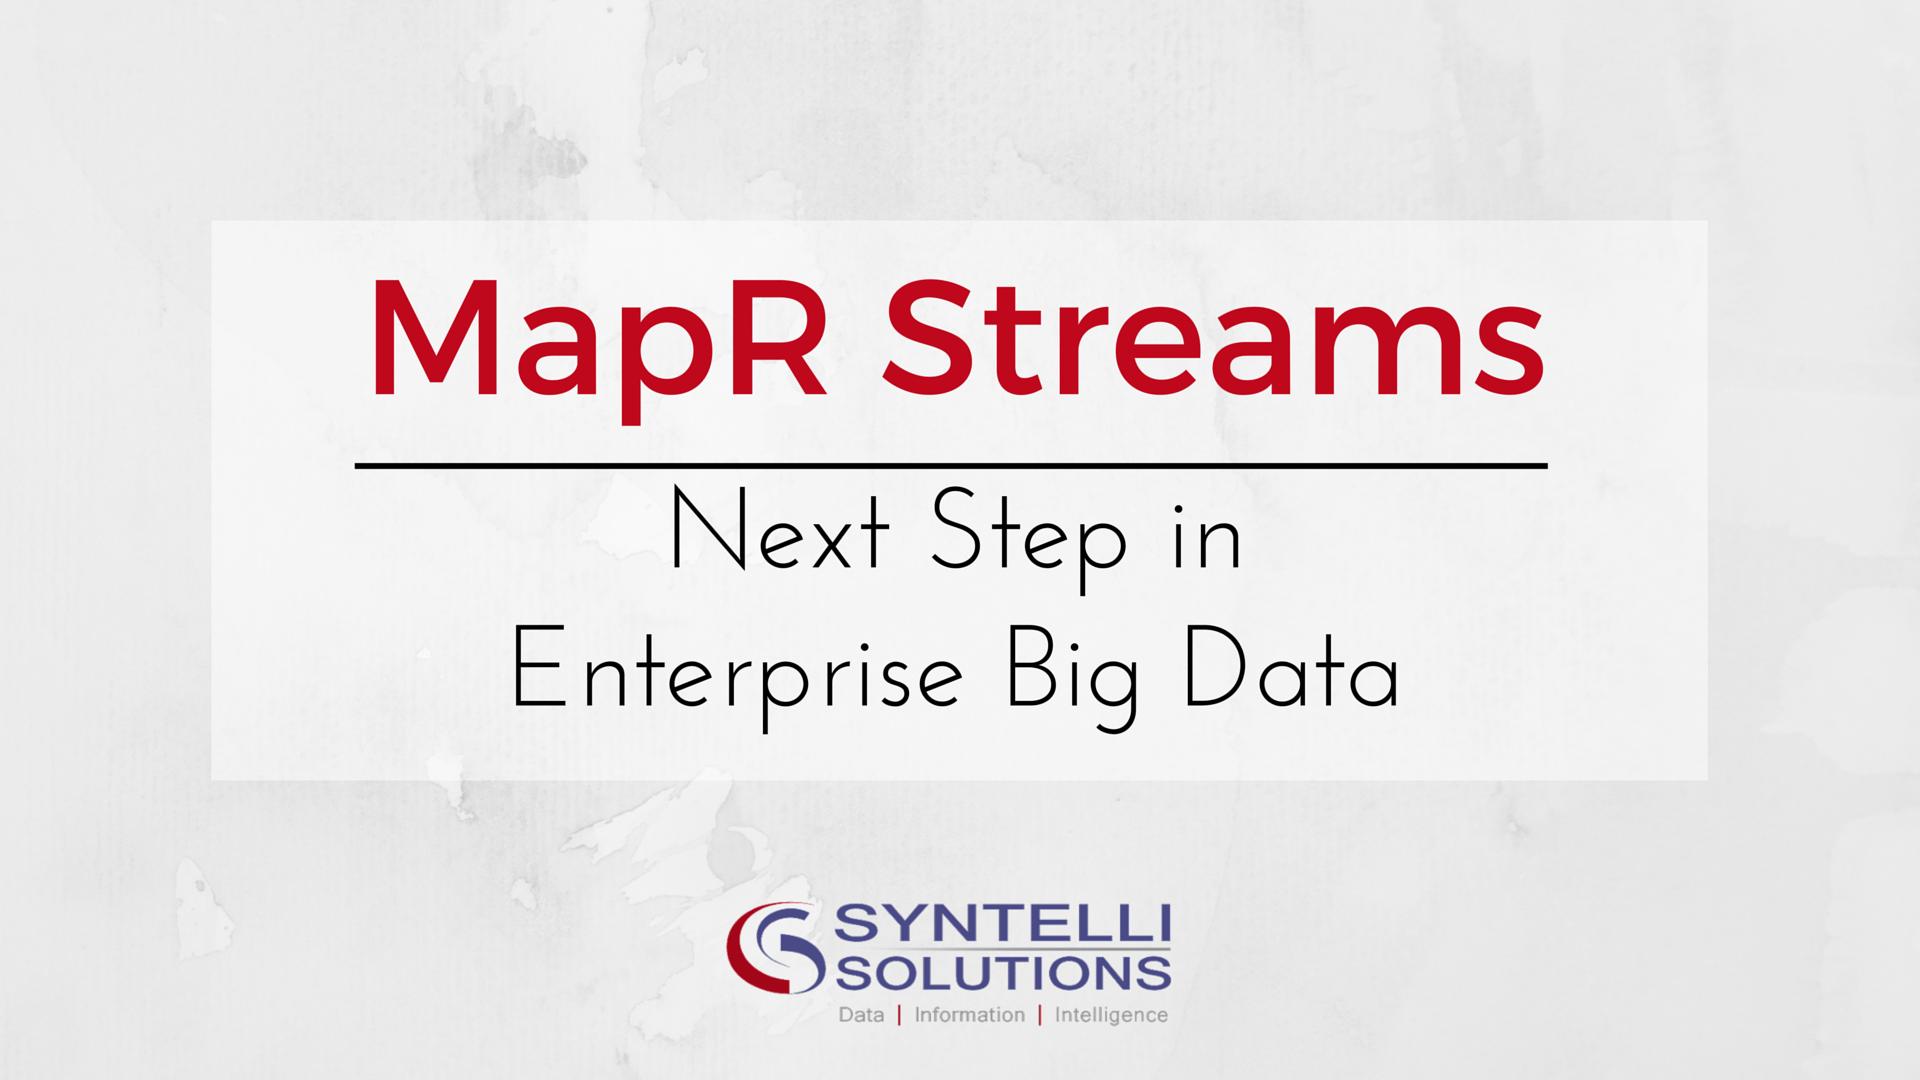 MapR Streams - Next Step in Enterprise Big Data